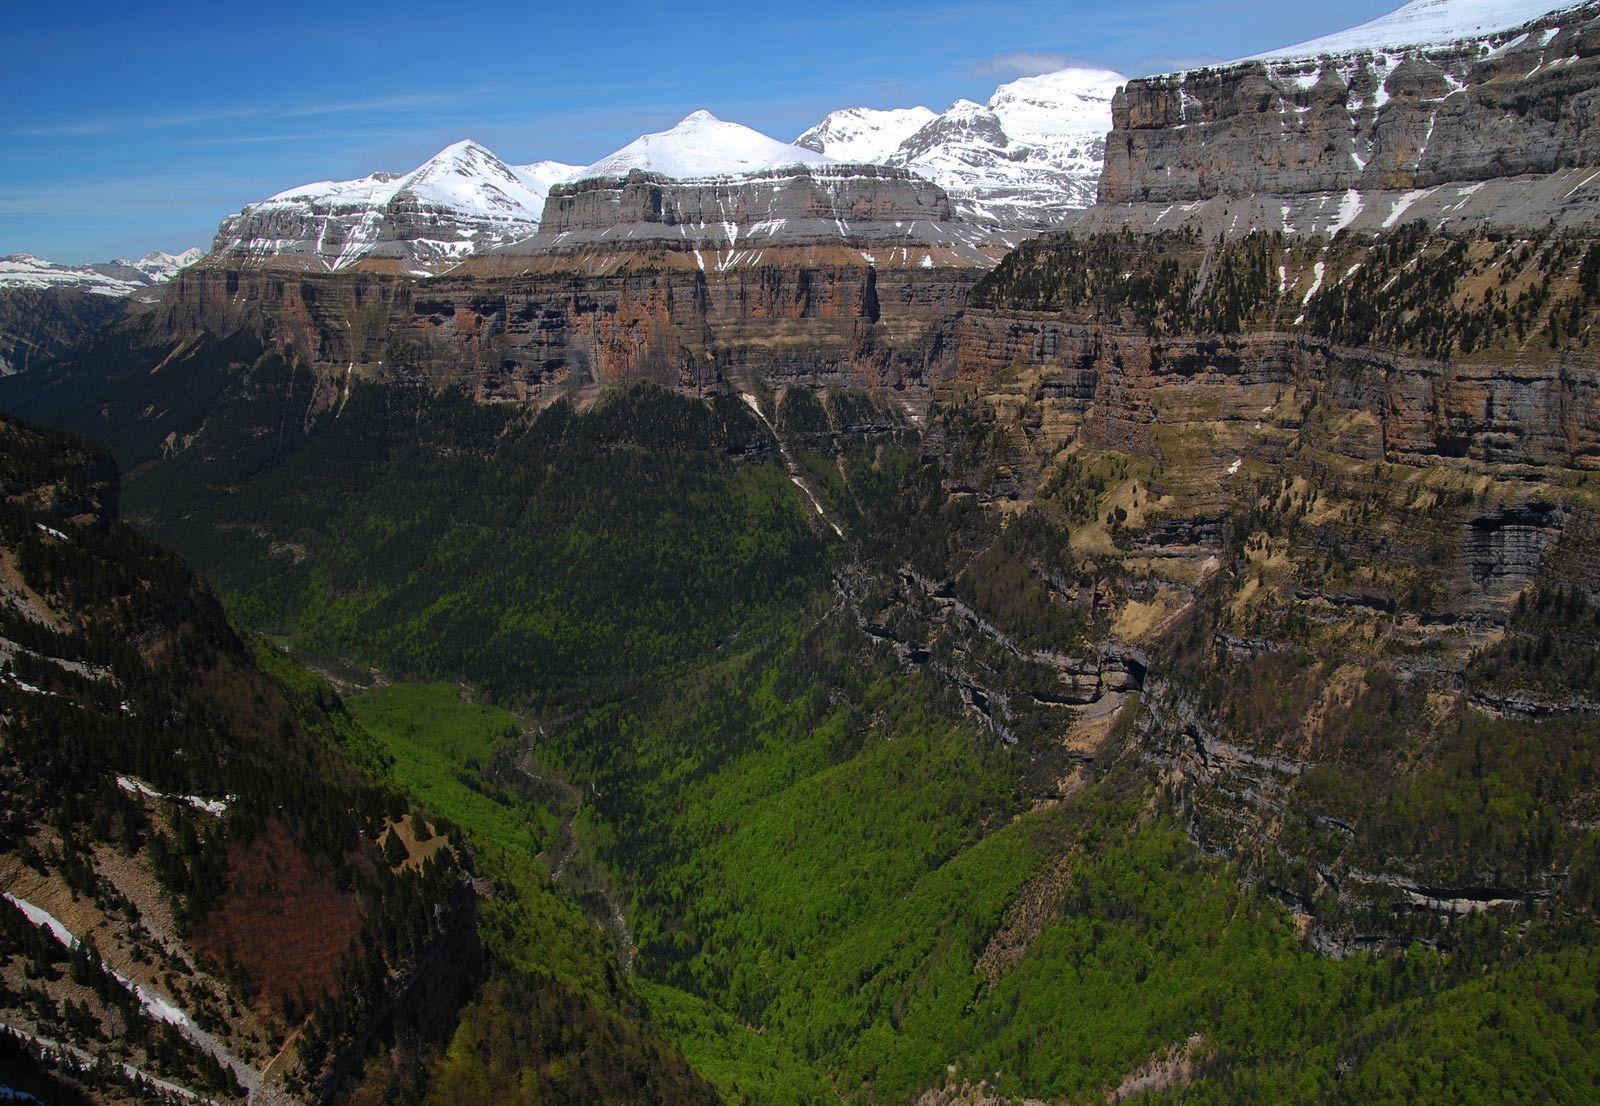 ¿Dónde puedes encontrar este paisaje?